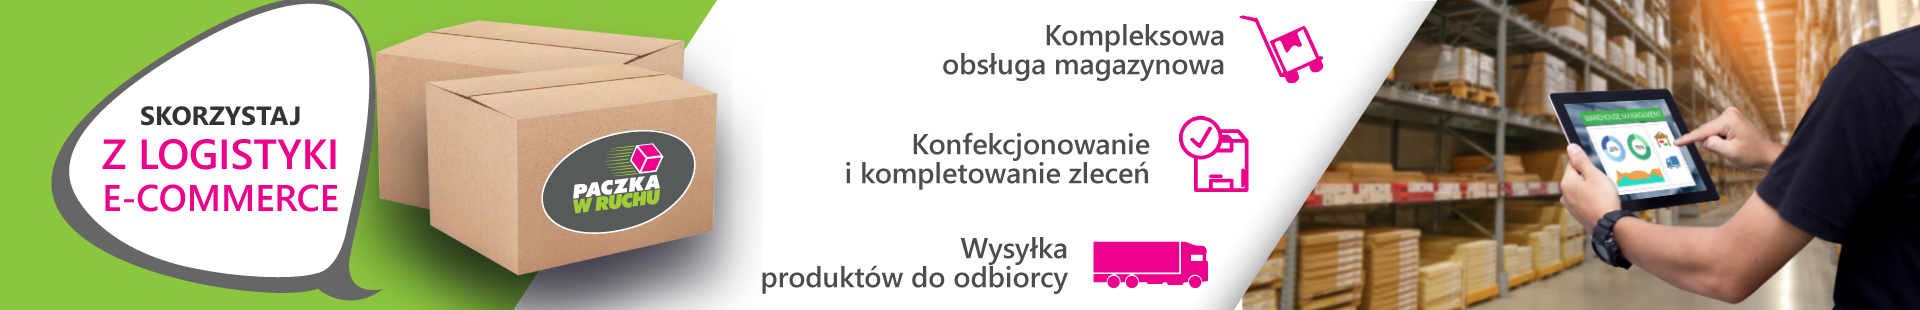 Logistyka_e-commerce